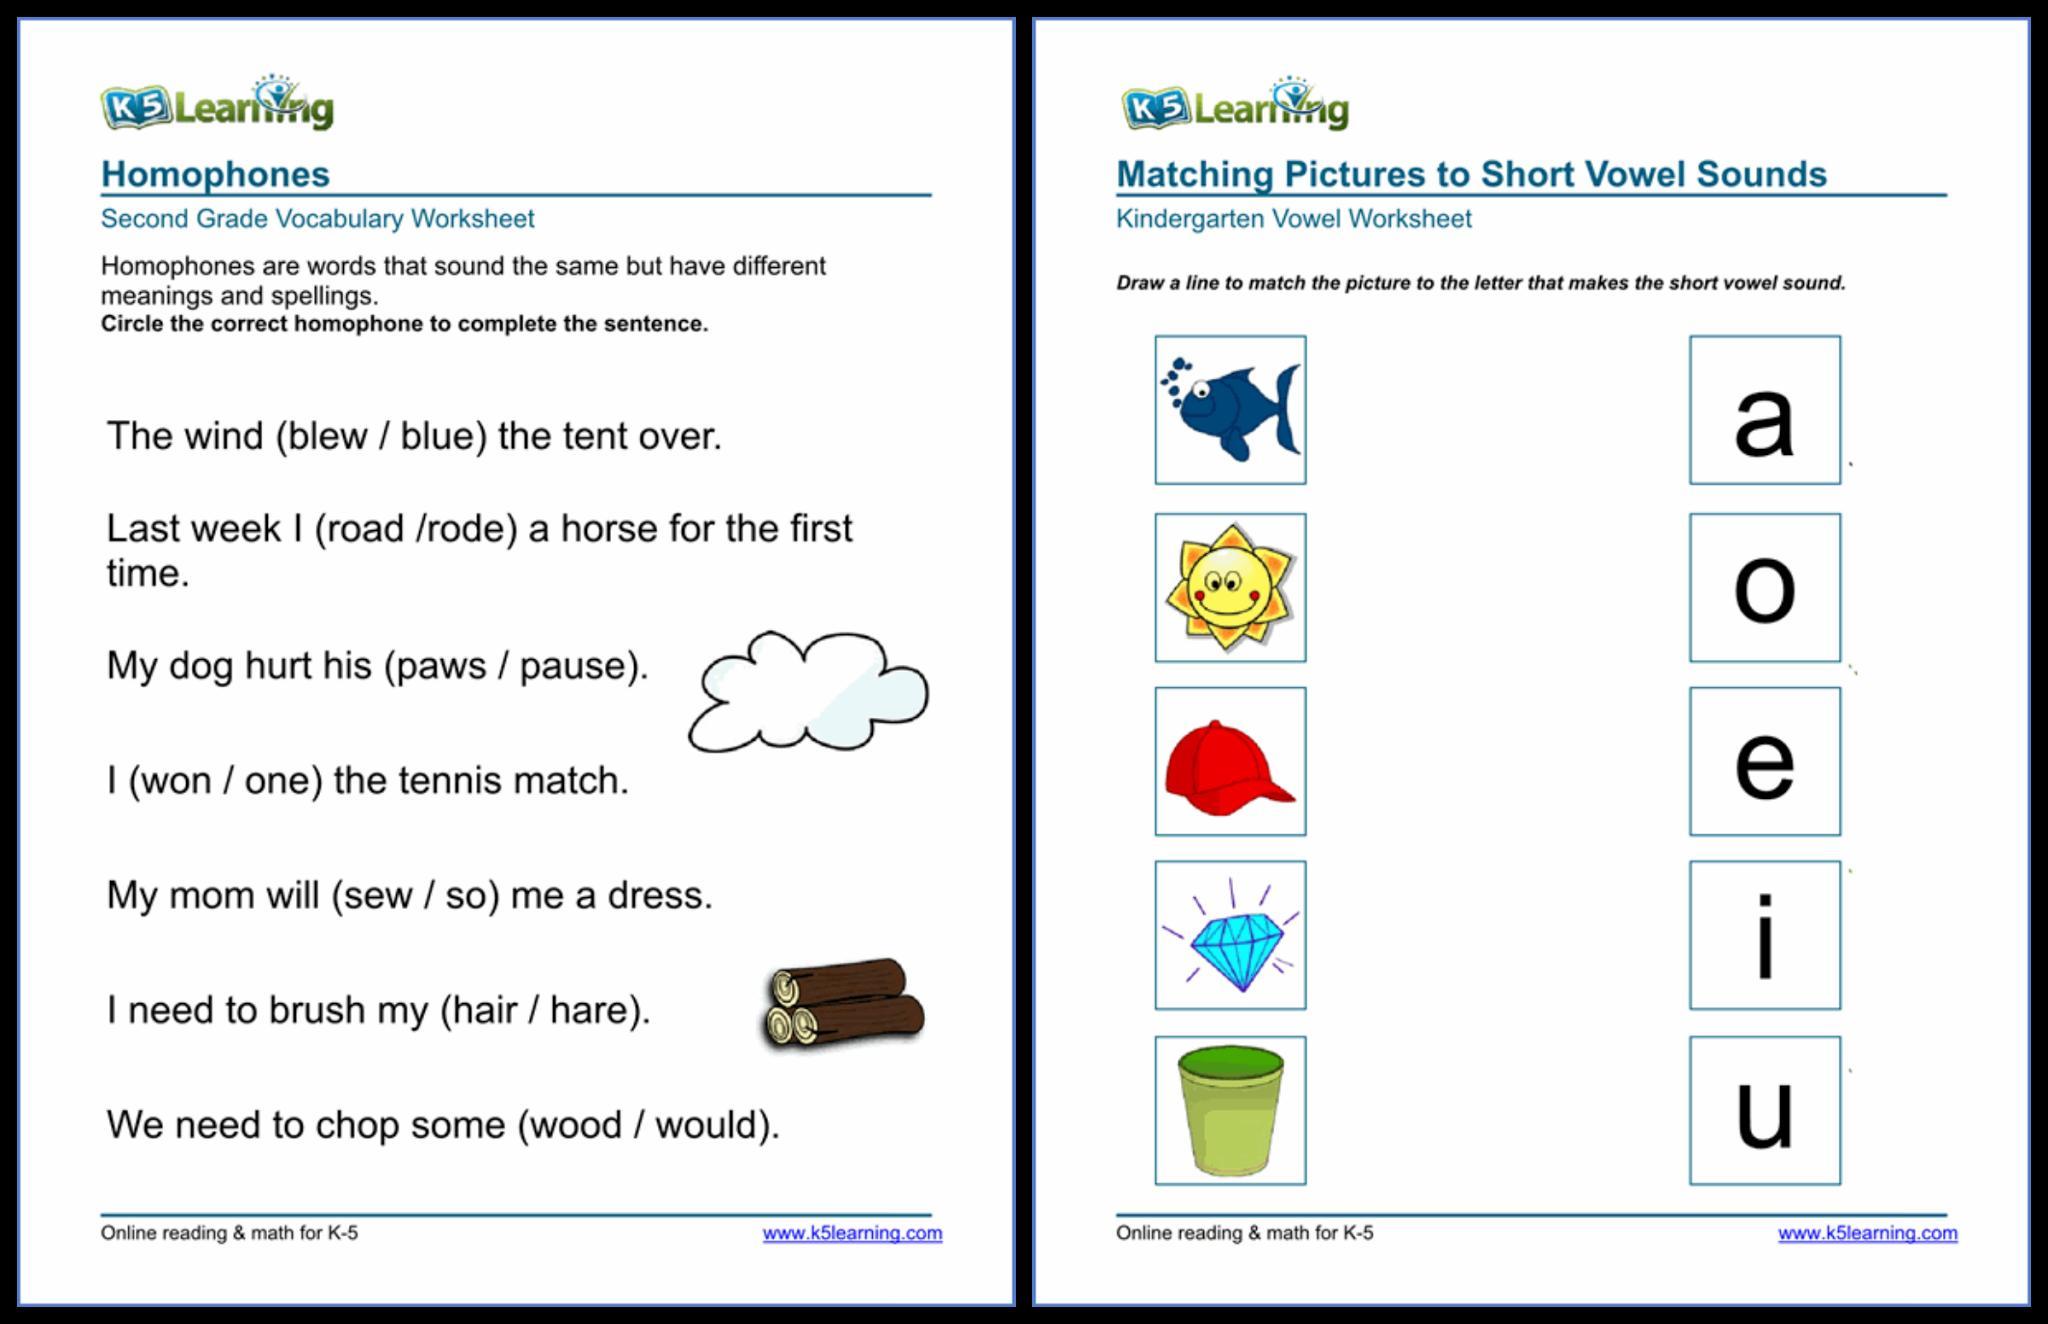 Multiplication Worksheets K5 Learning 1